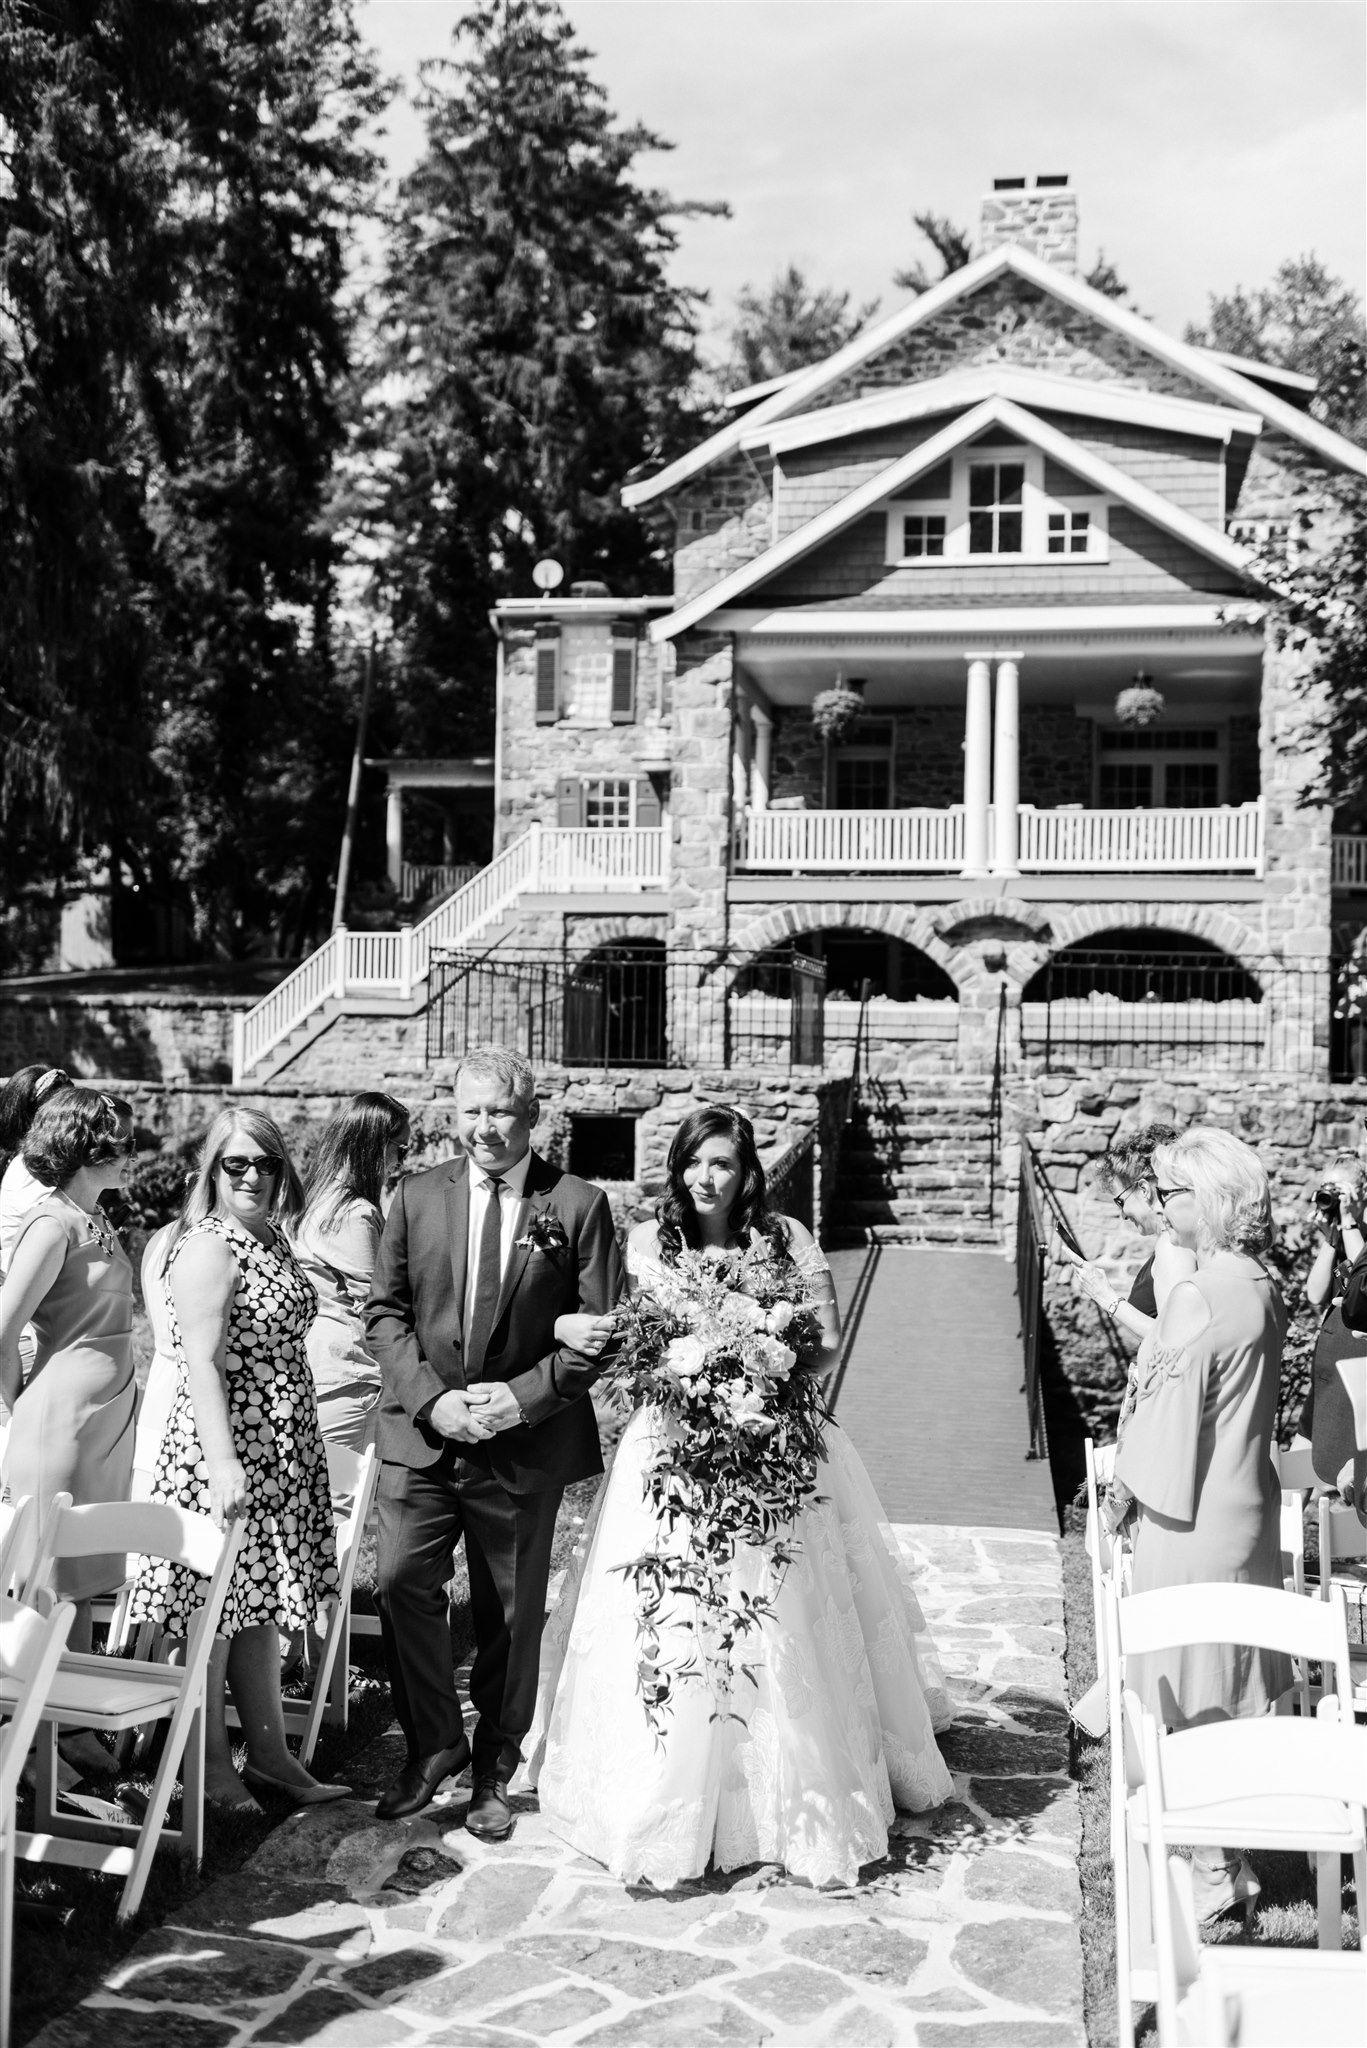 Historic Shady Lane Greenhouse Wedding Venue Katie Price